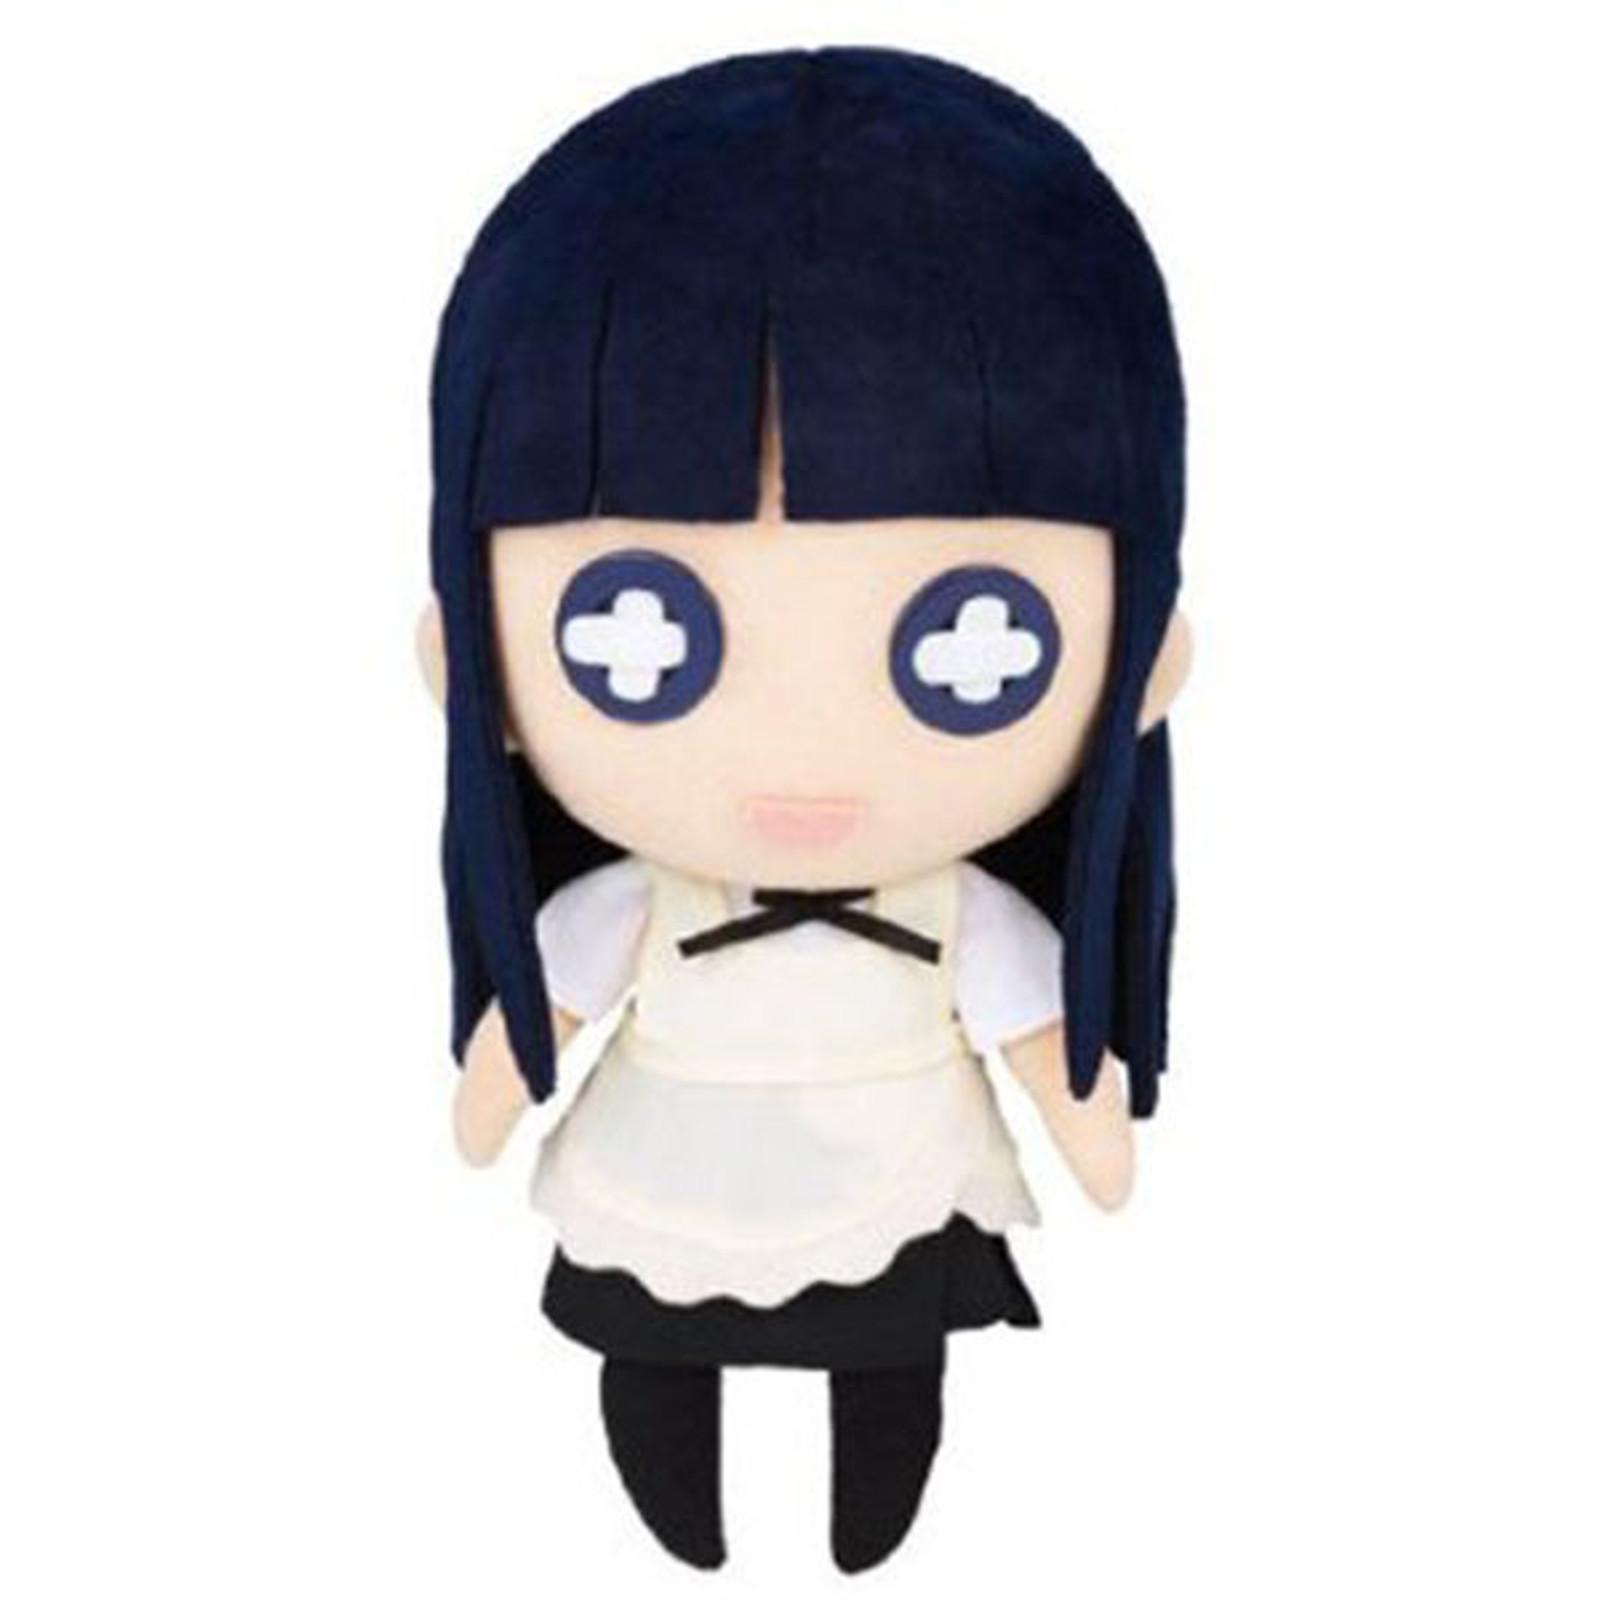 "Working! Aoi Yamada Ningyou Plush Doll Figure 9"" Banpresto JAPAN ANIME"